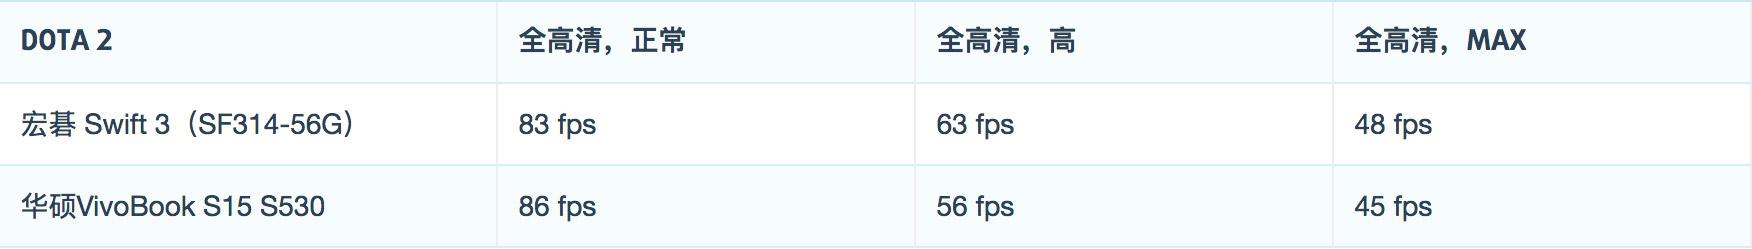 Acer 宏碁 蜂鸟Swift 3(SF314-56G)评测